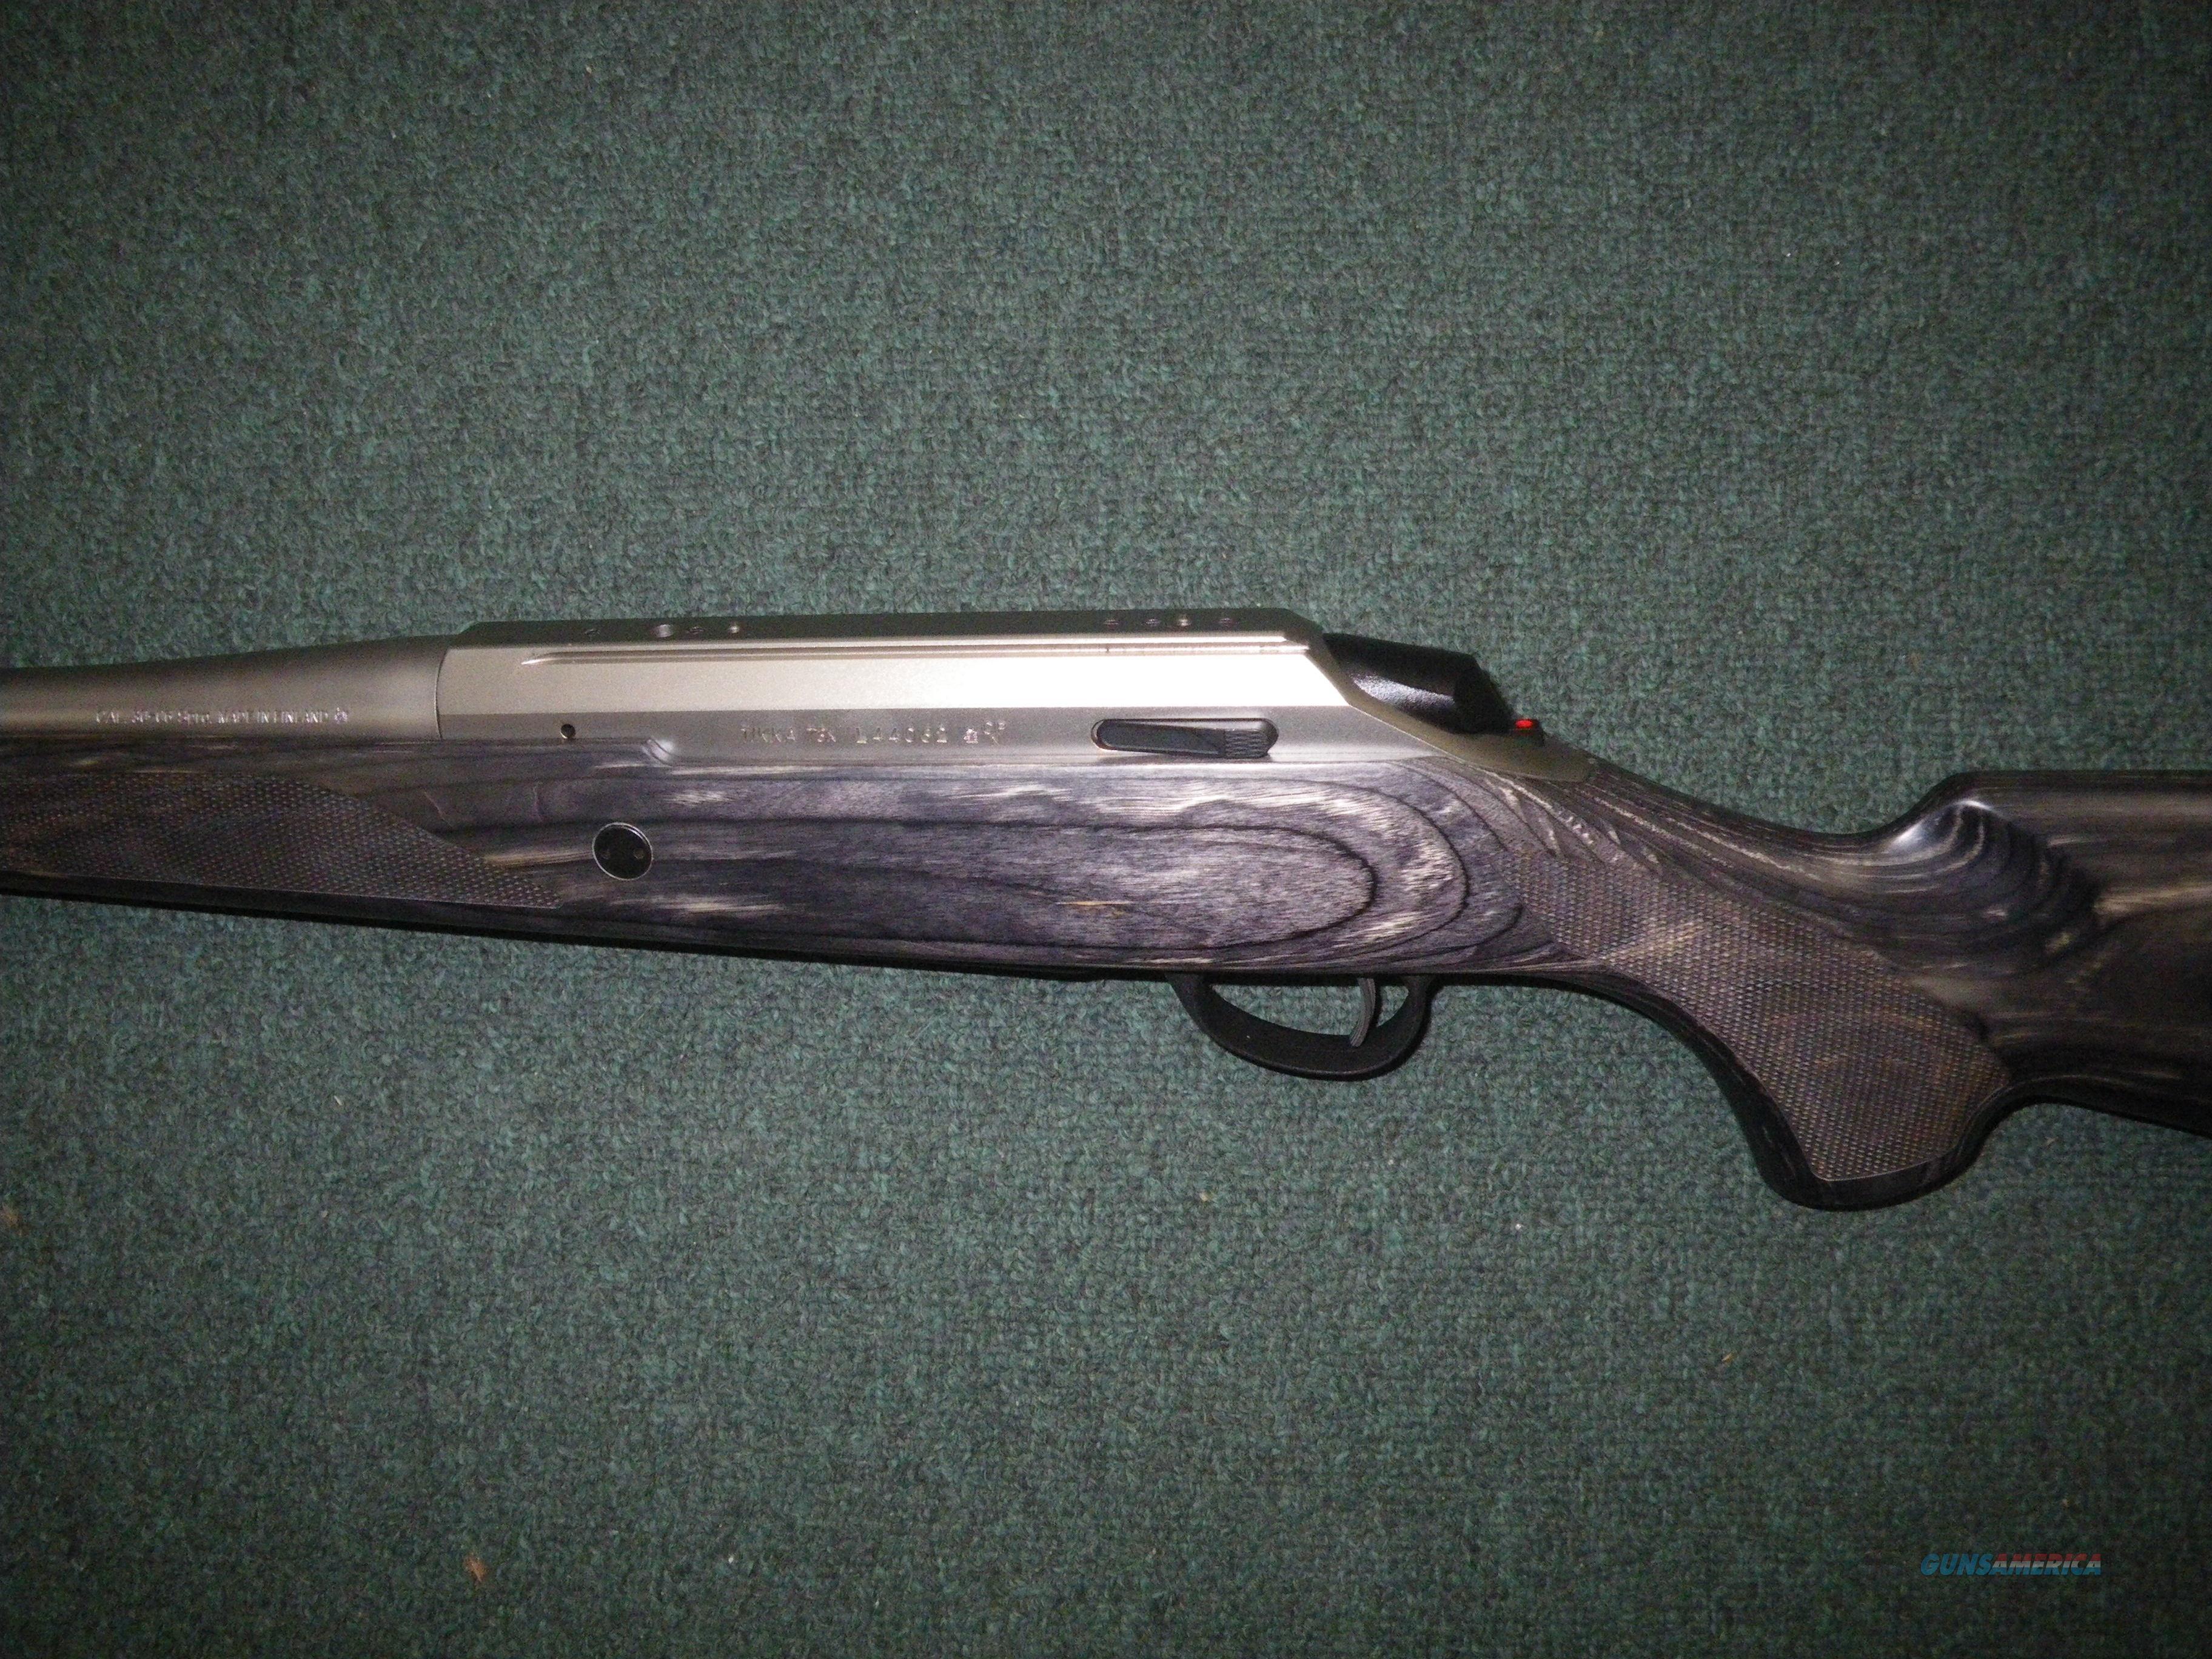 "Tikka T3x Laminated Stainless 260 Rem 22.4"" NEW #JRTXG321  Guns > Rifles > Tikka Rifles > T3"